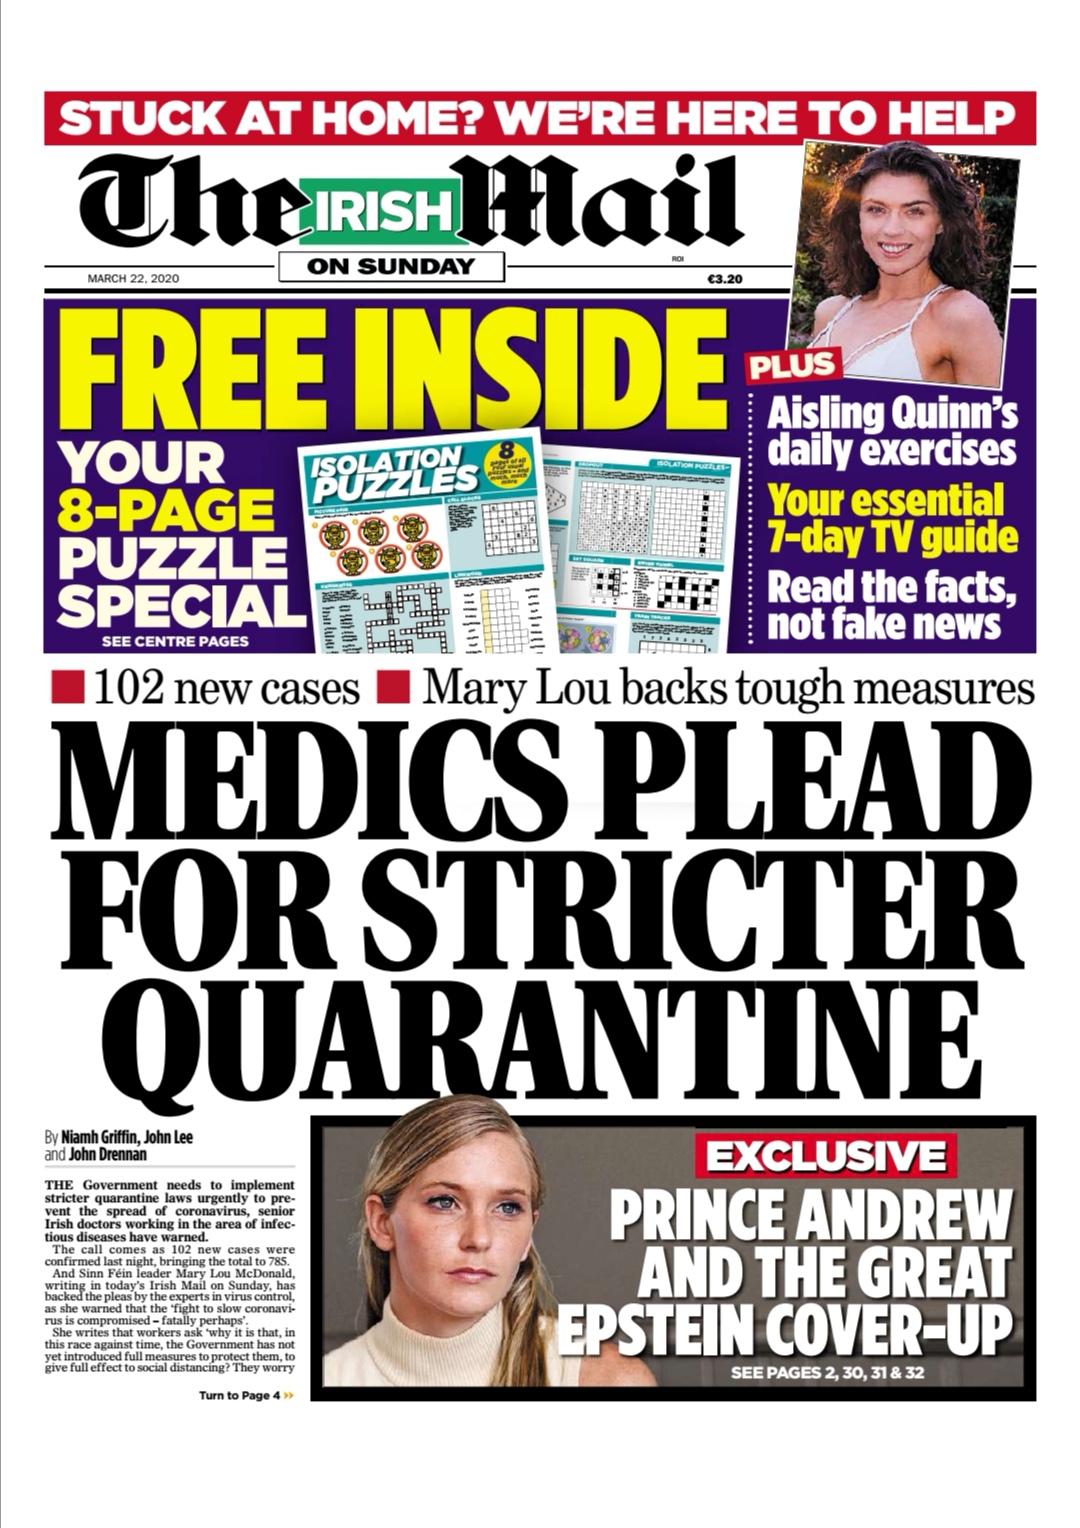 Medics Plead for Stricter Quarantine